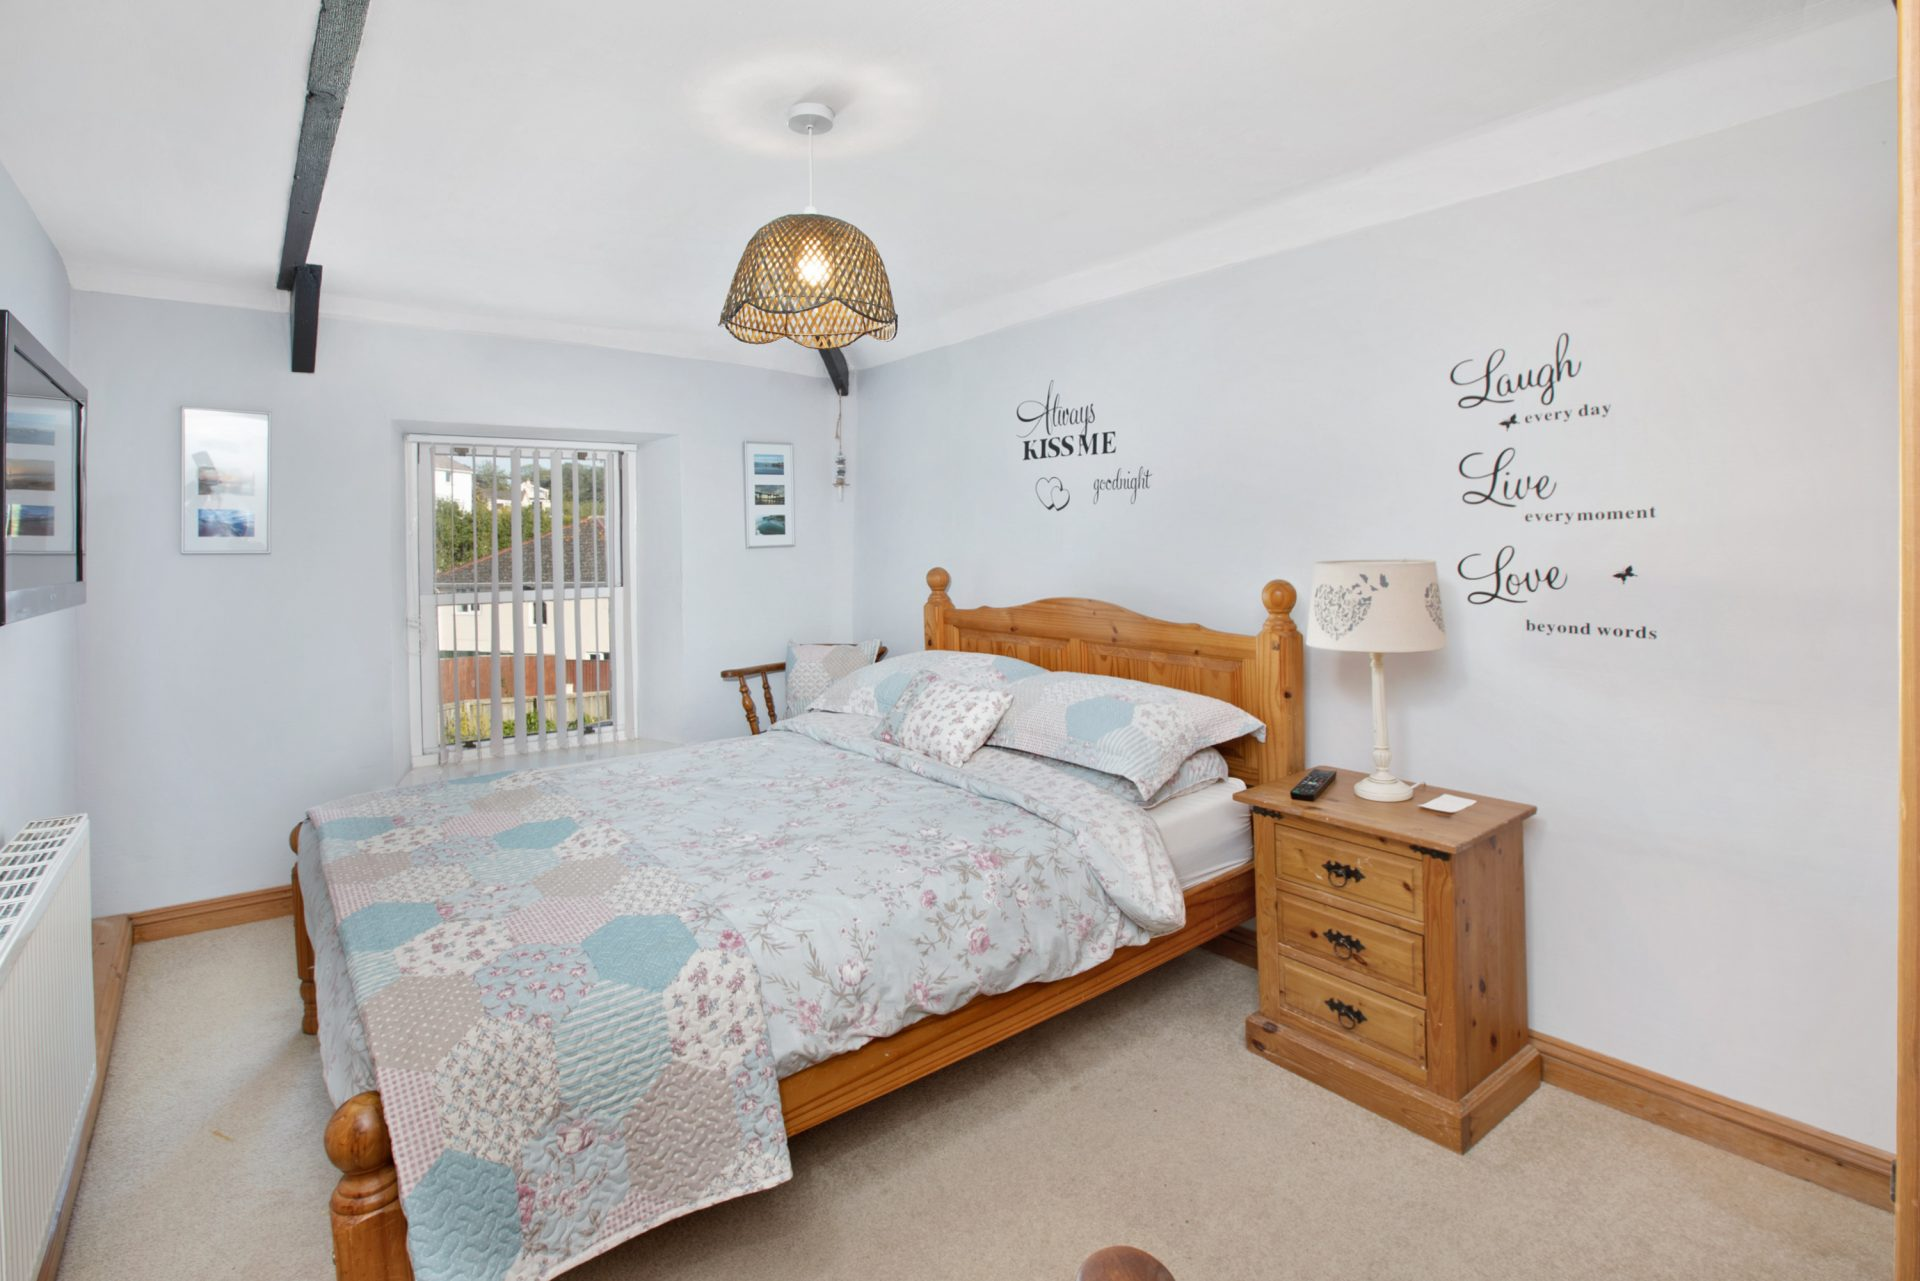 devon holiday home interior design before the decoration